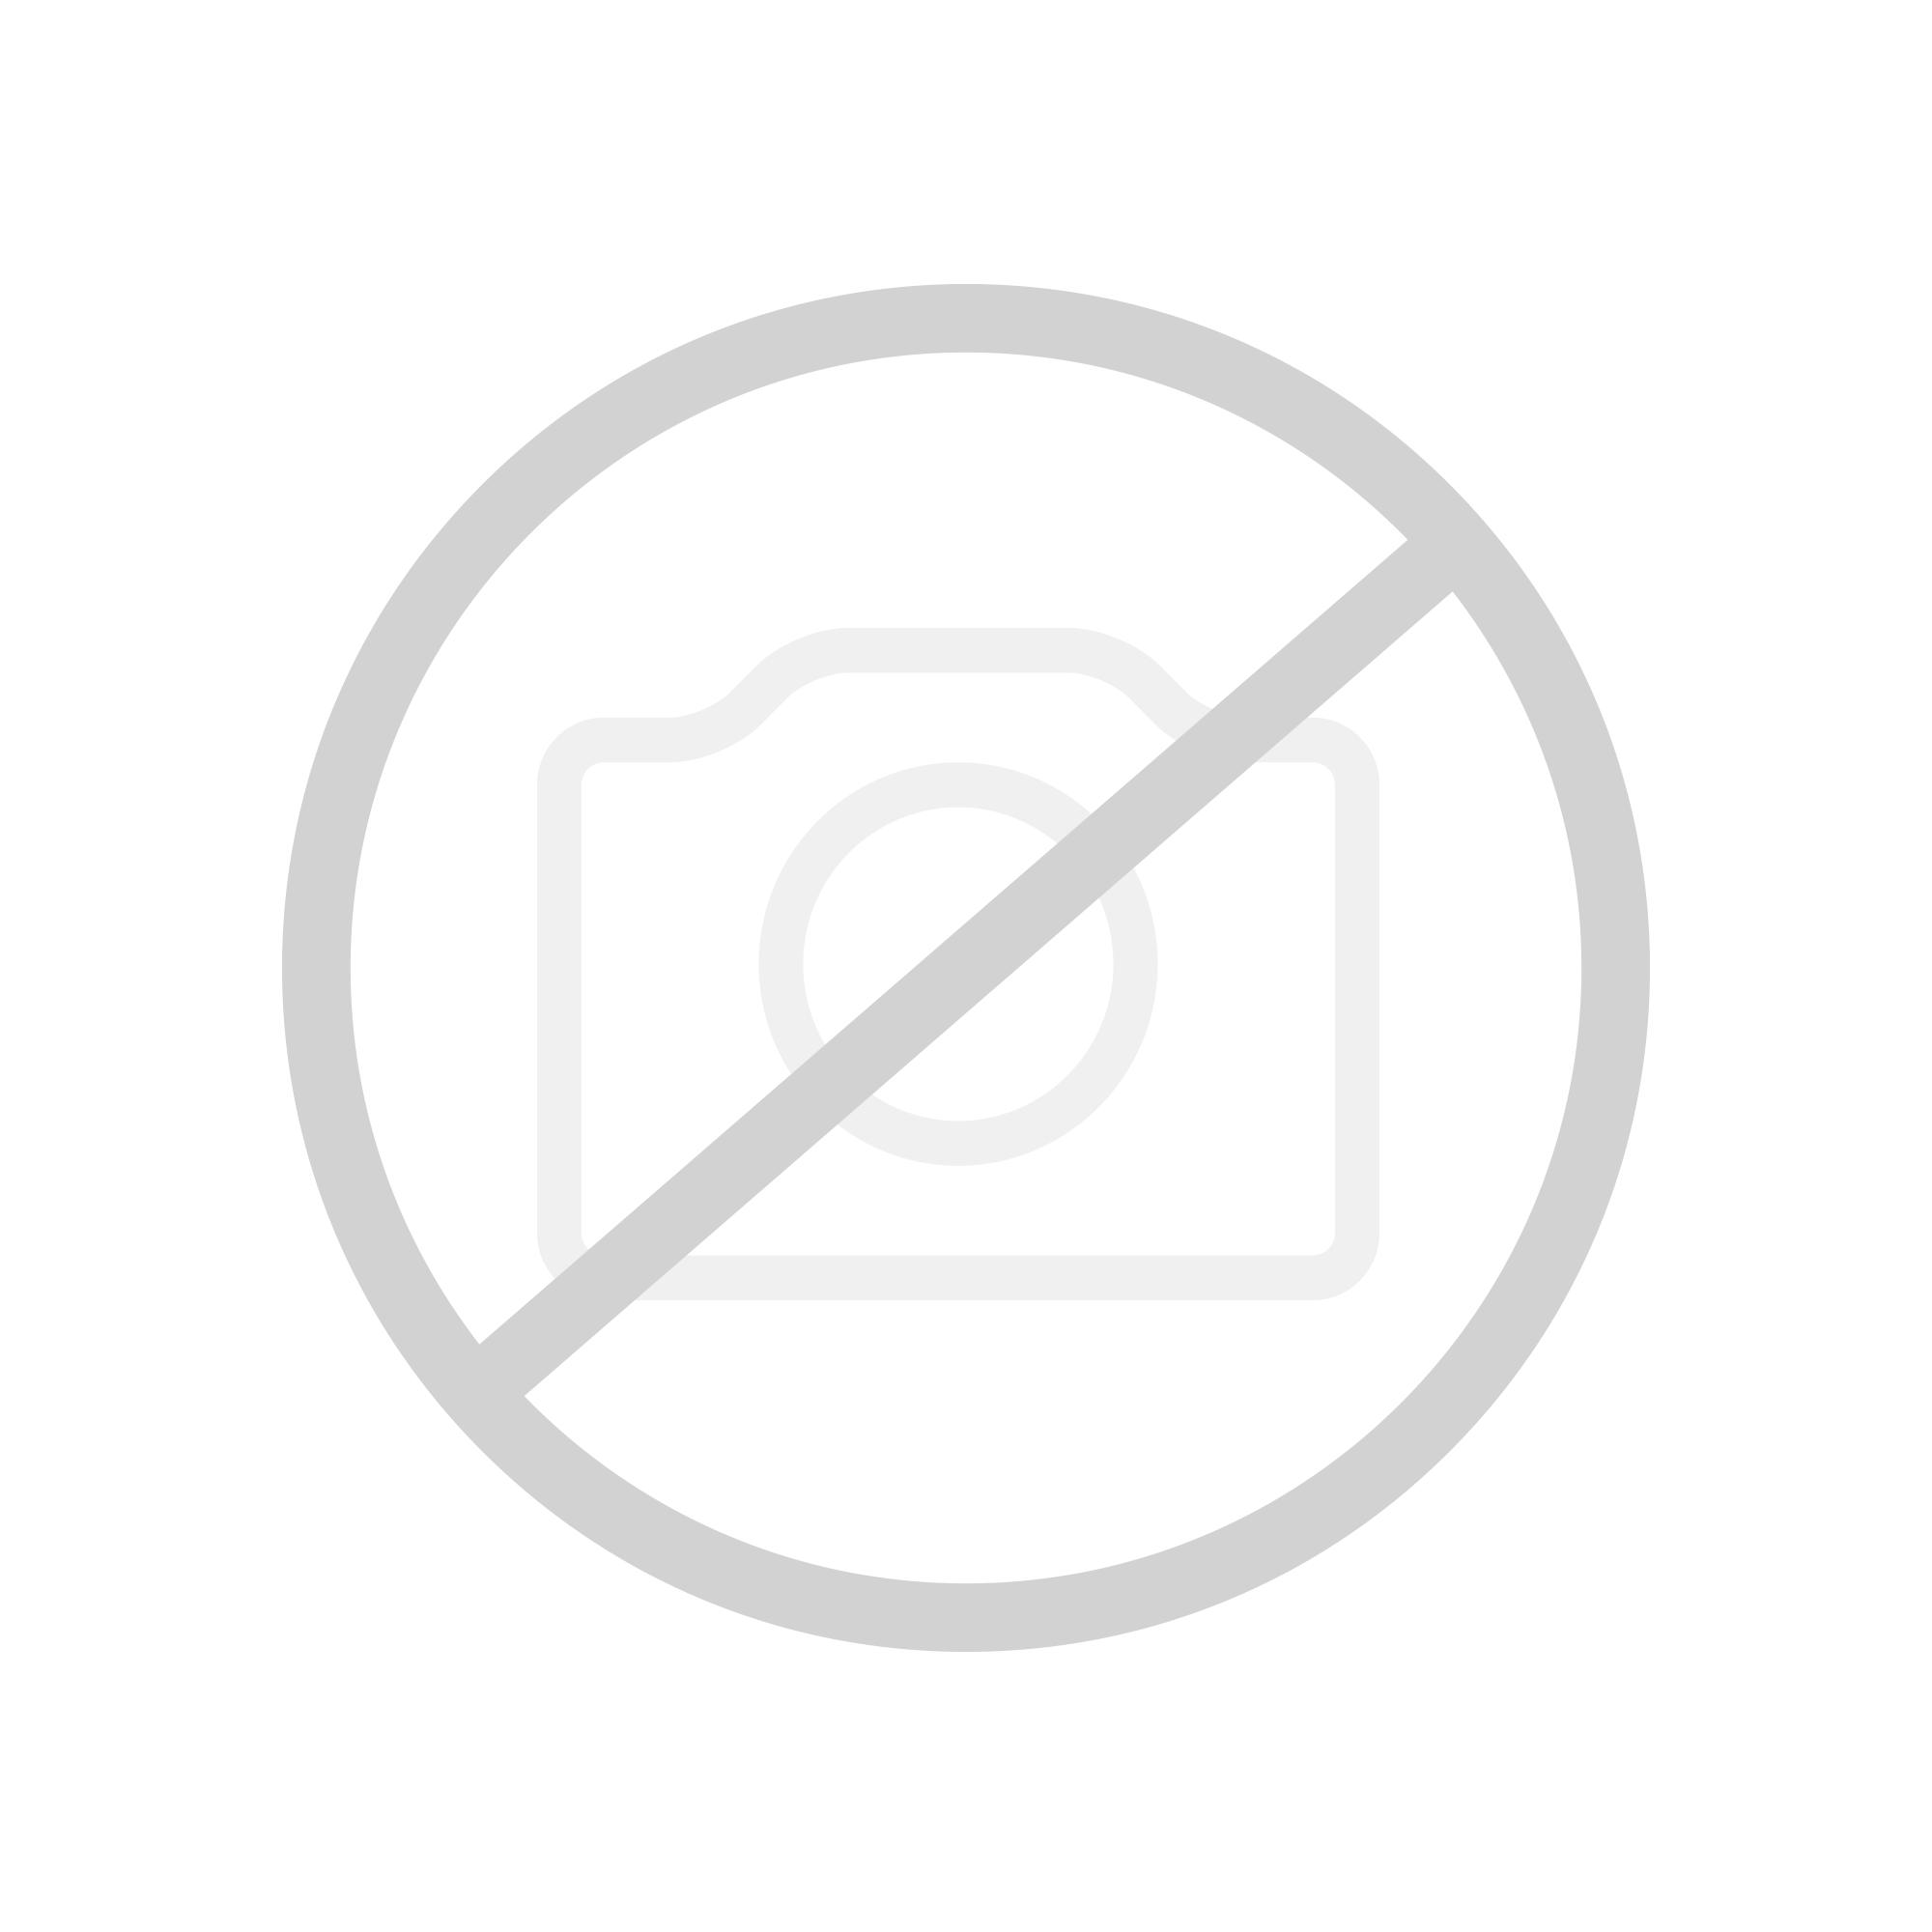 louis poulsen PH 4 ½-3 ½ Stehleuchte